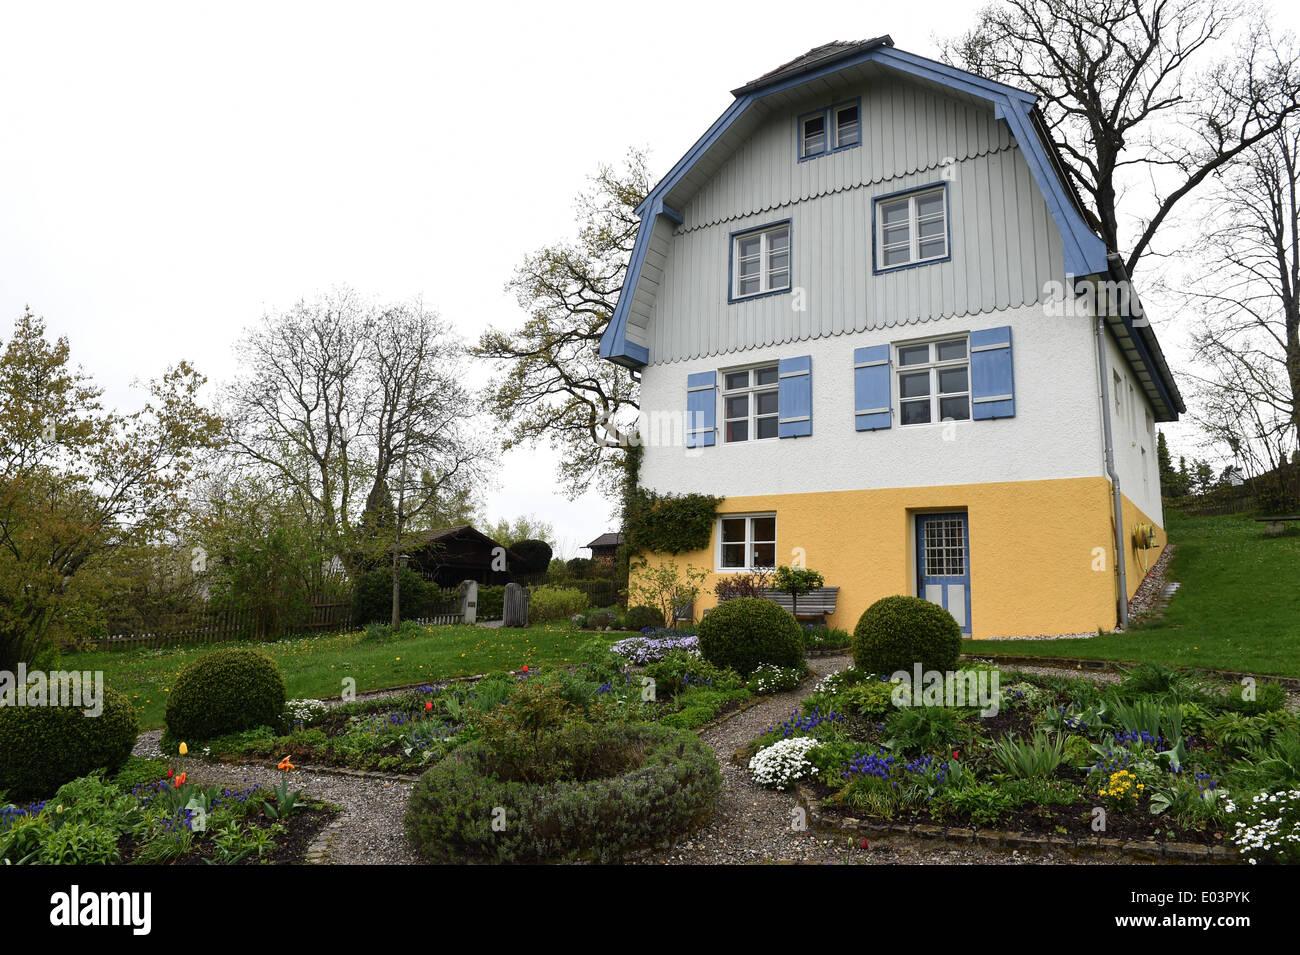 Murnau Allemagne 18 Avr 2014 Une Vue Sur La Pittoresque